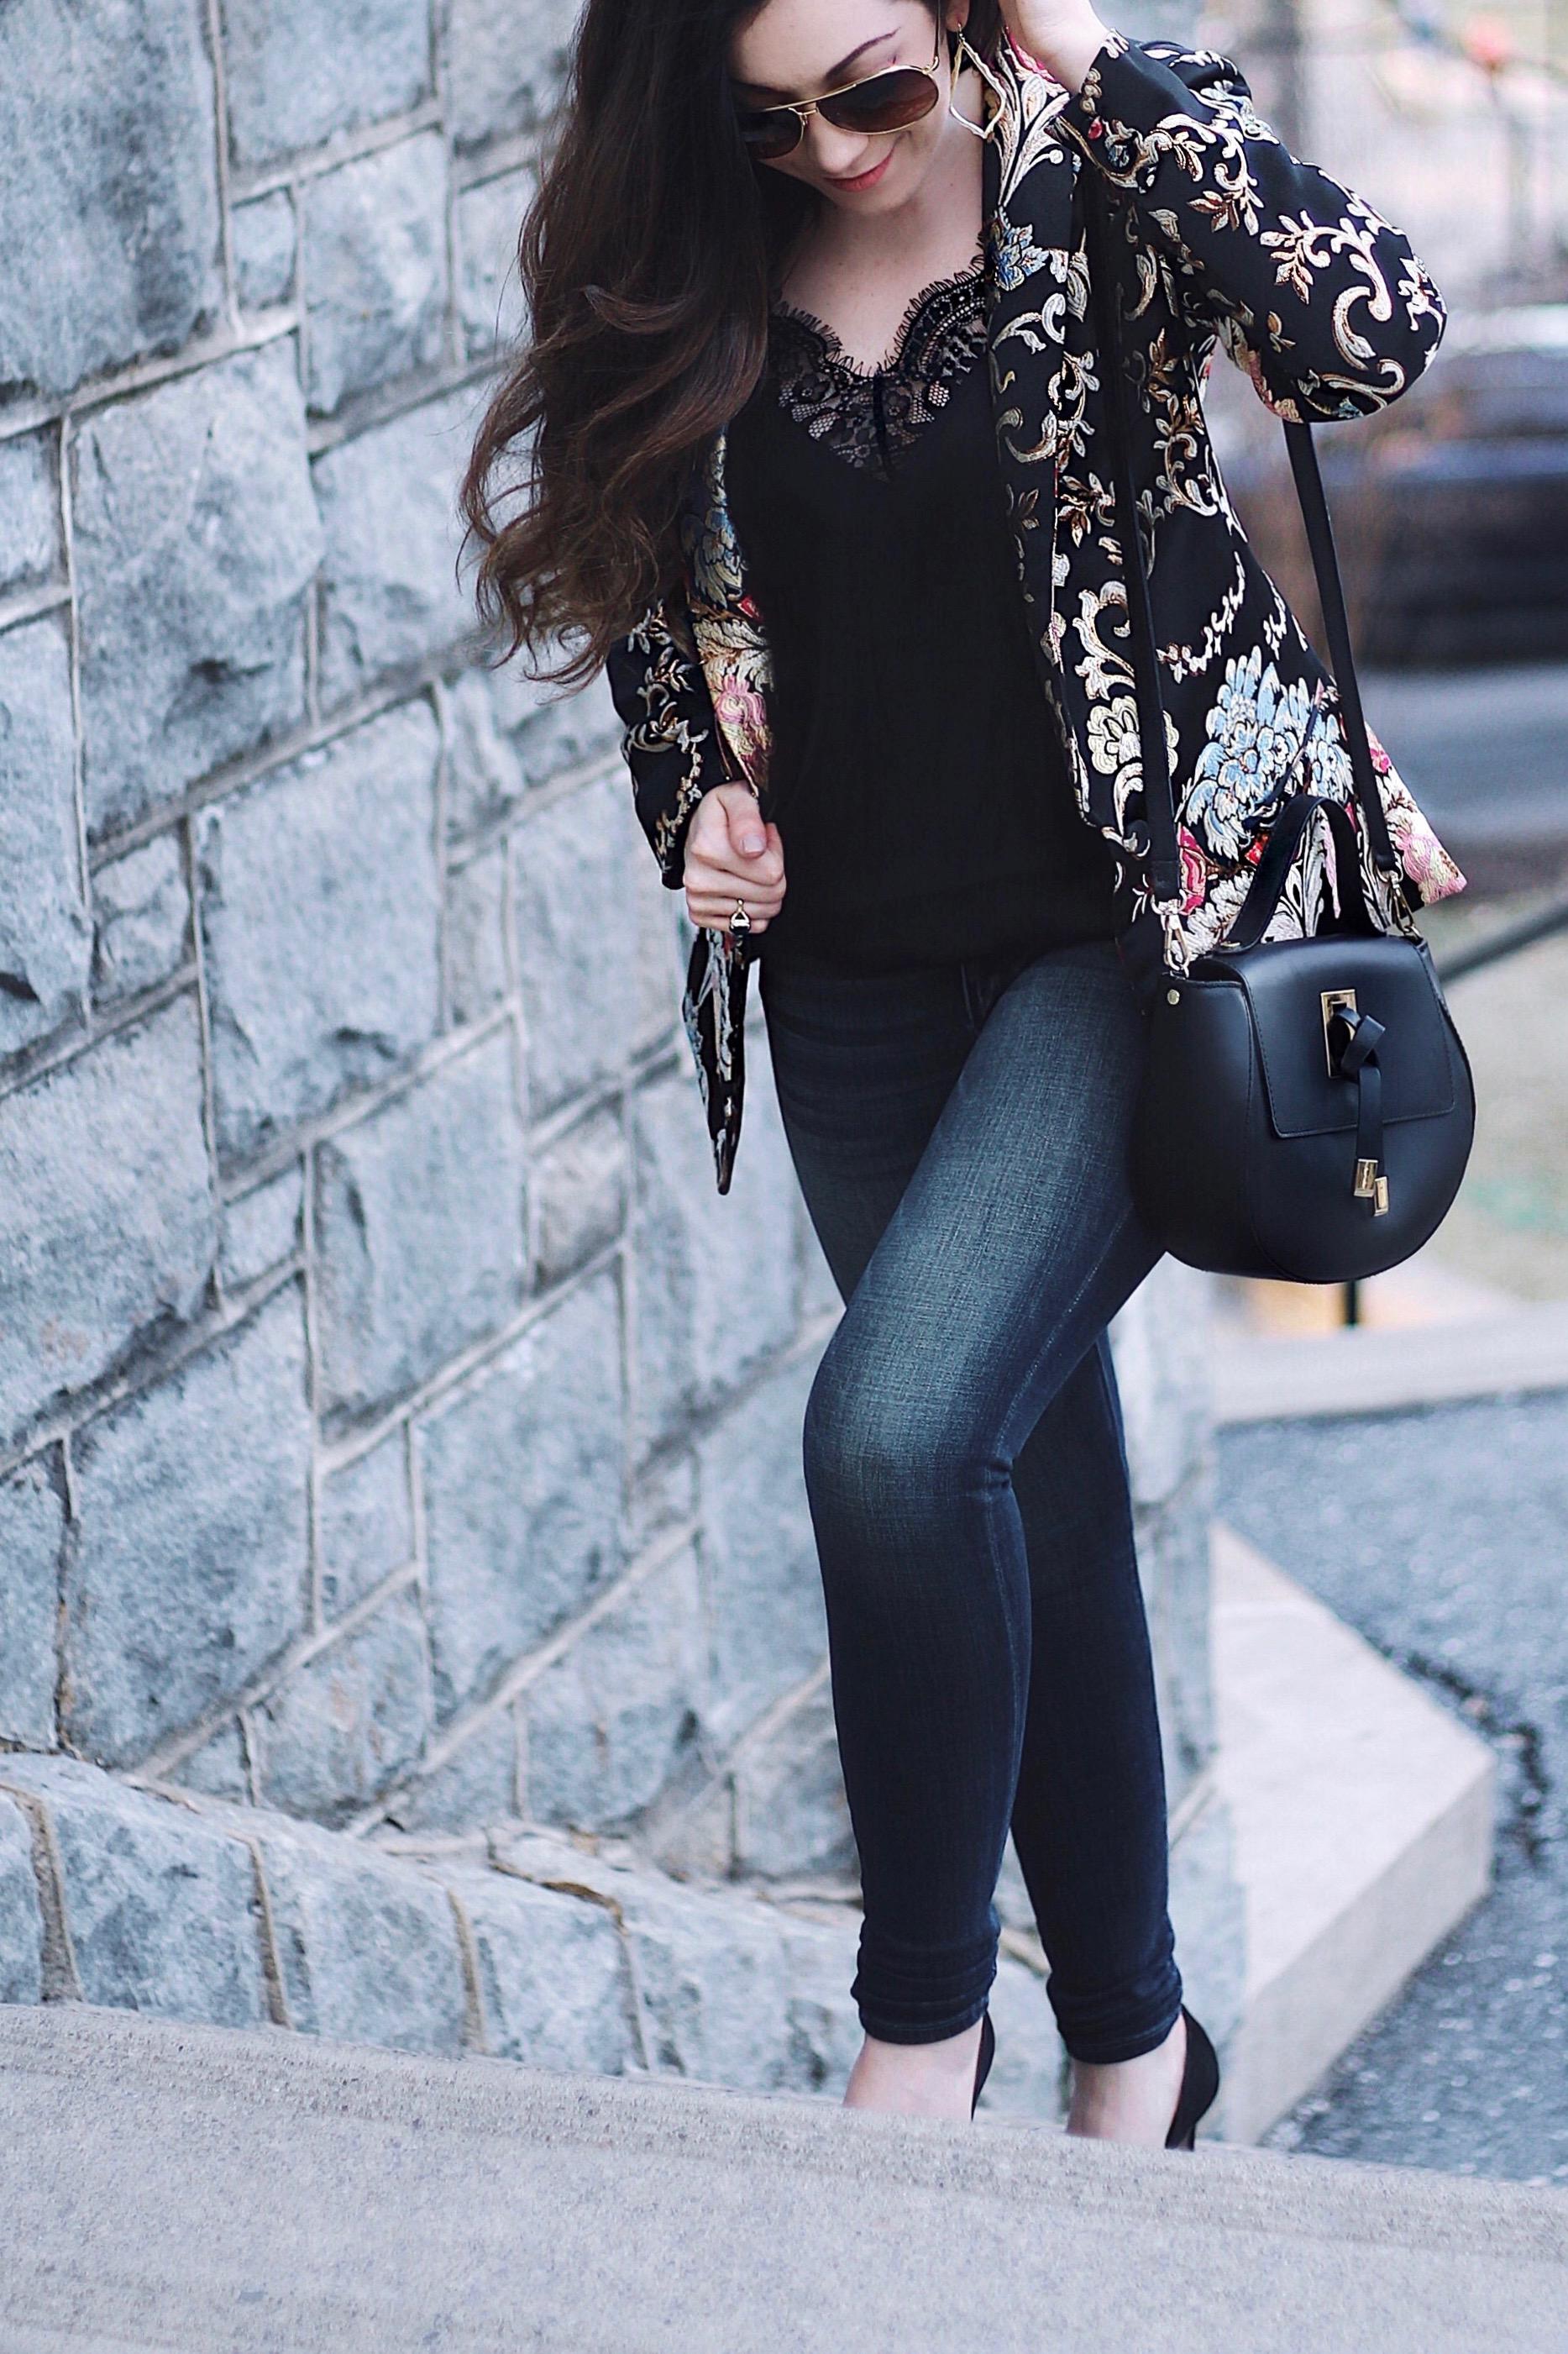 Capsule Wardrobe Series - LPA Floral Statement Blazer - Street Style